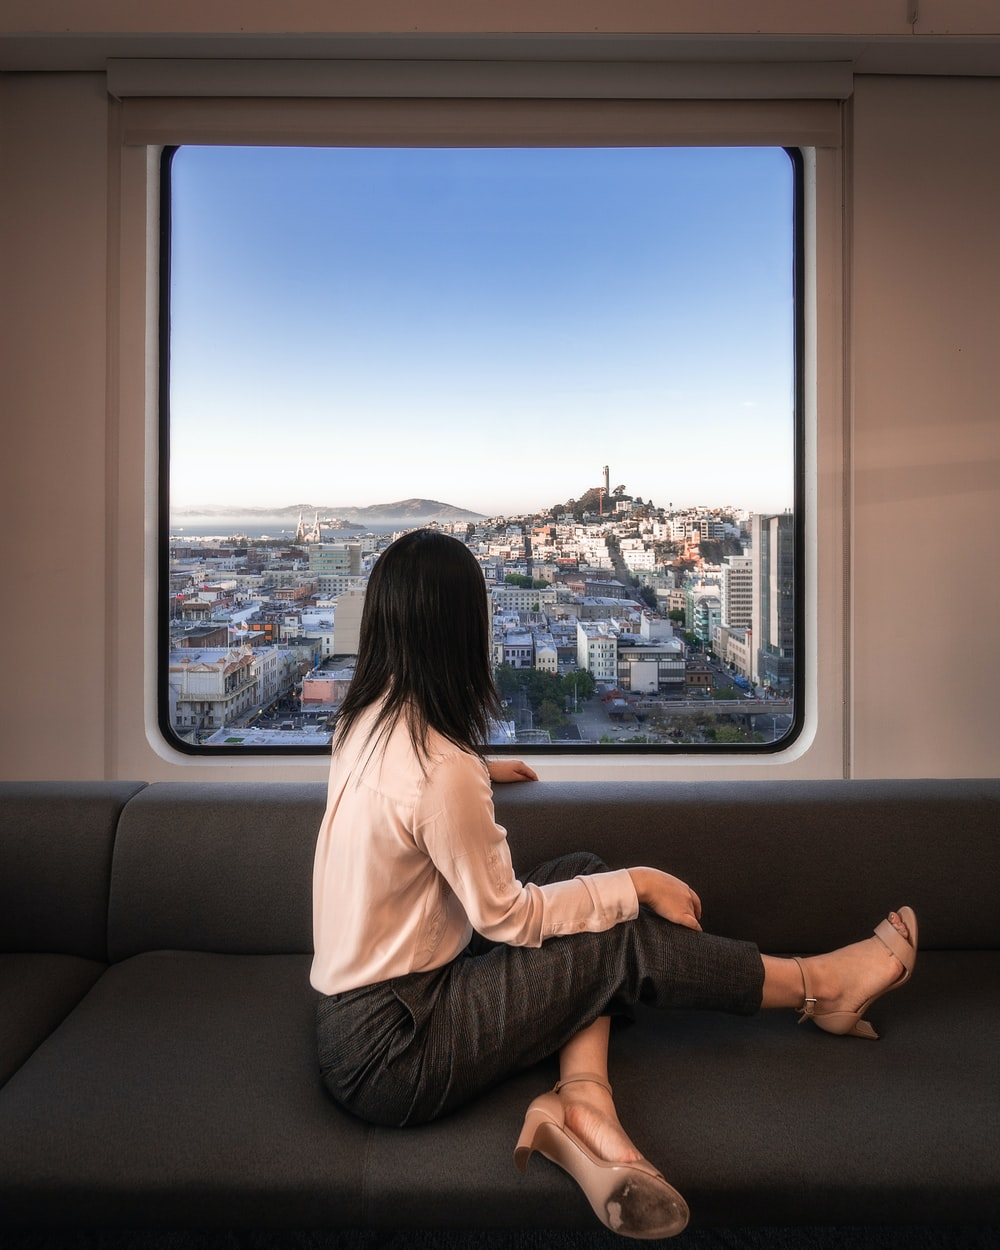 woman sitting on sofa near window